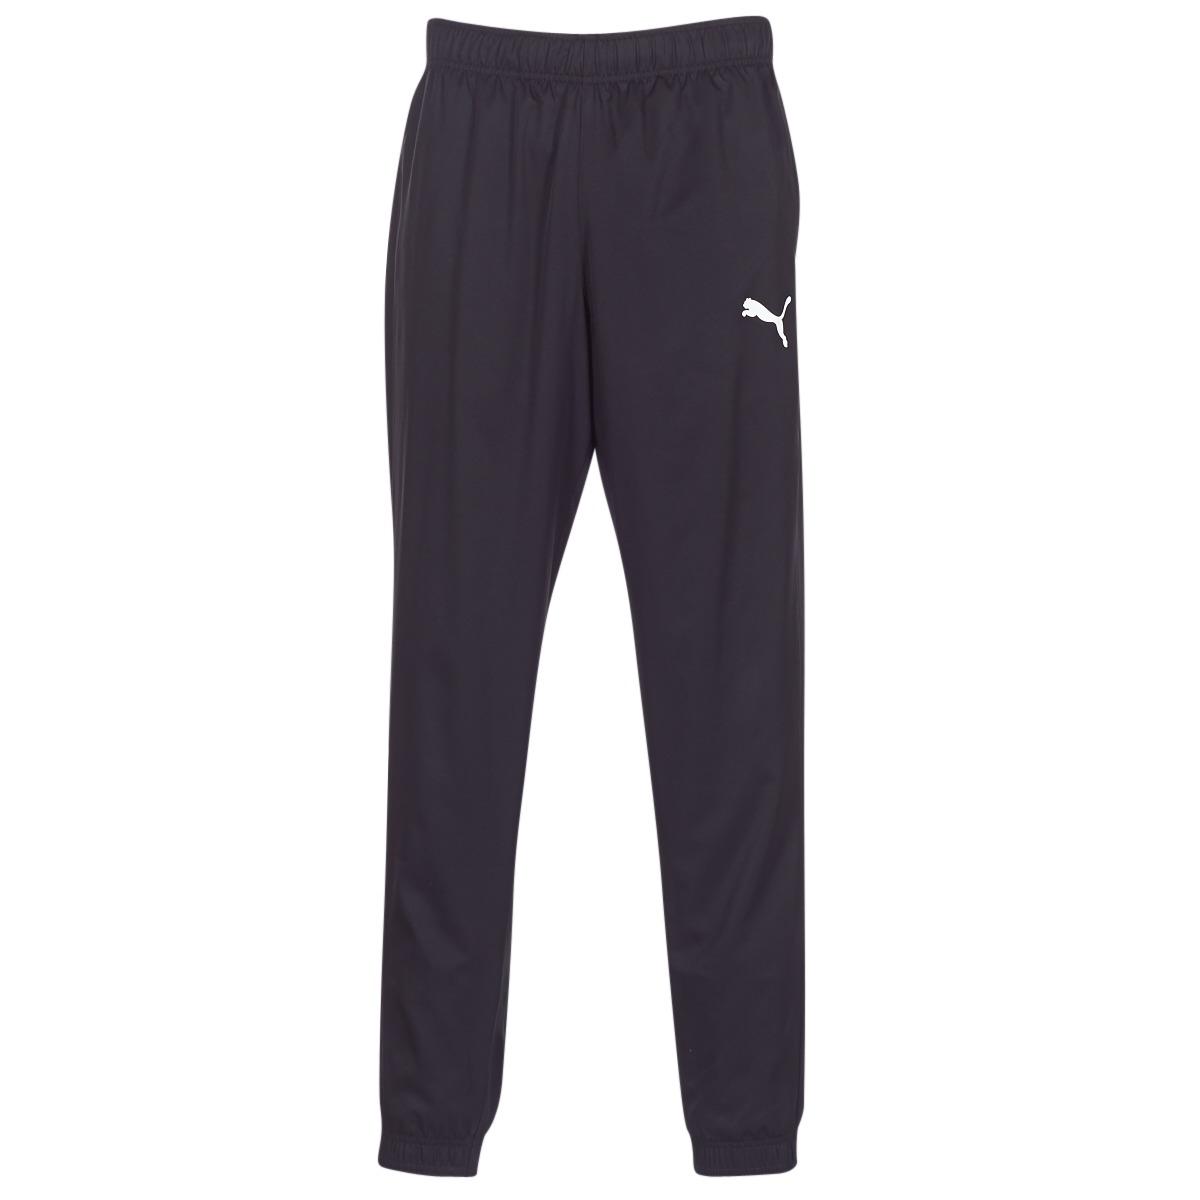 Joggingtøj / Træningstøj Puma  ACTIVE WOVEN PANT